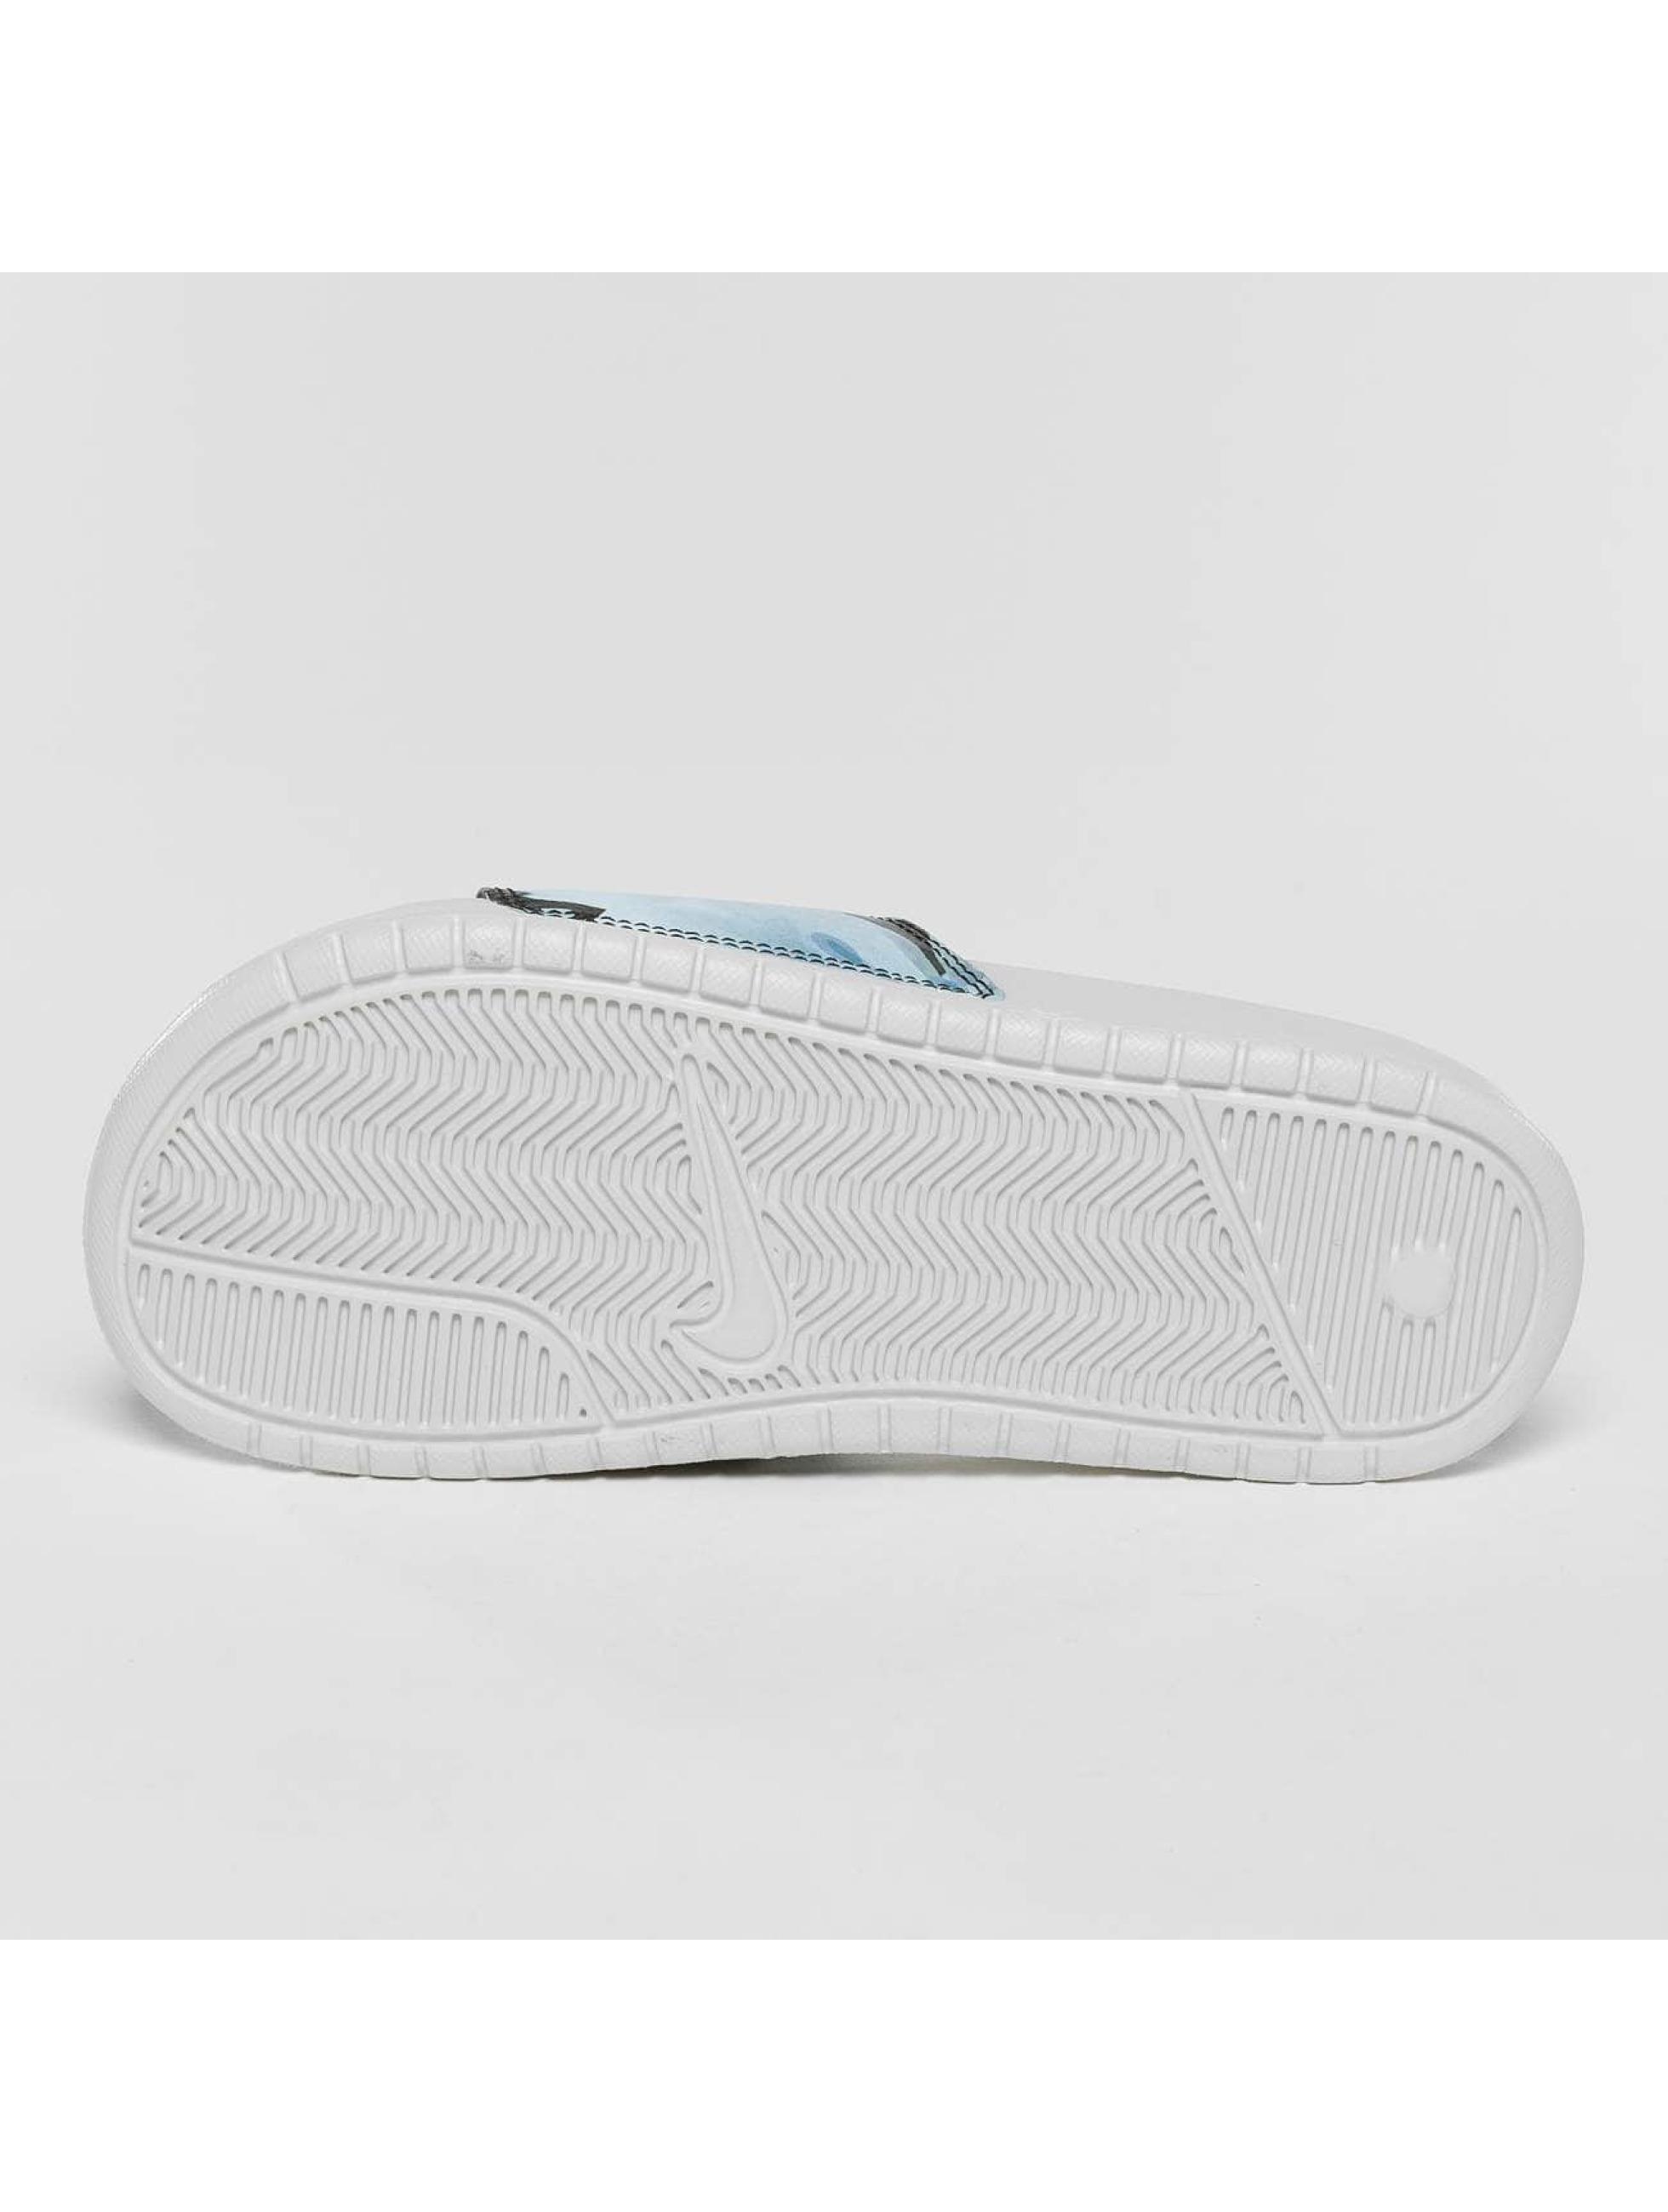 Nike Claquettes & Sandales Benassi Just Do It blanc